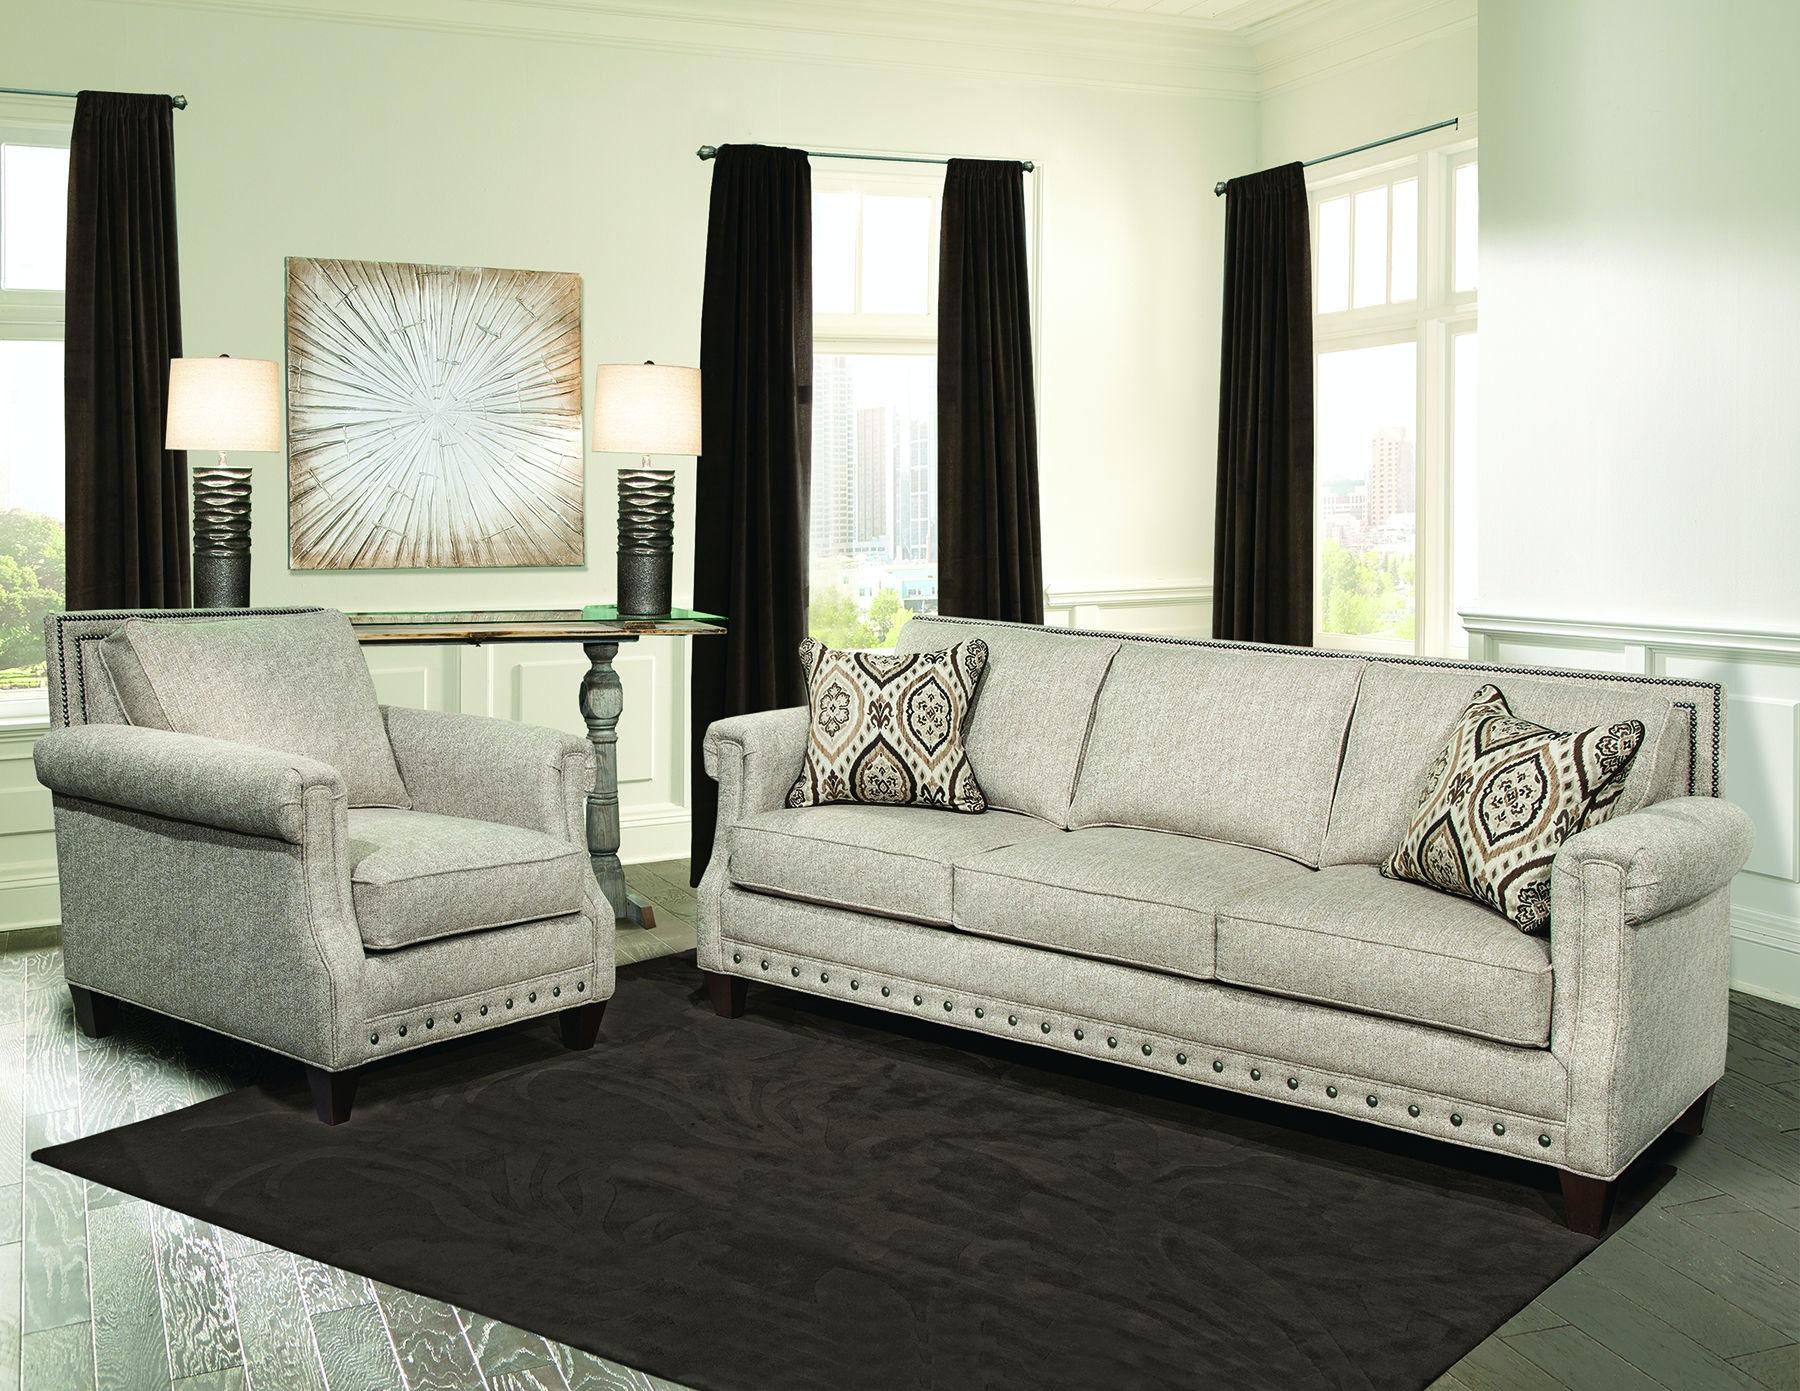 Awesome Marshfield Furniture Beckett Sofa MF1968 03